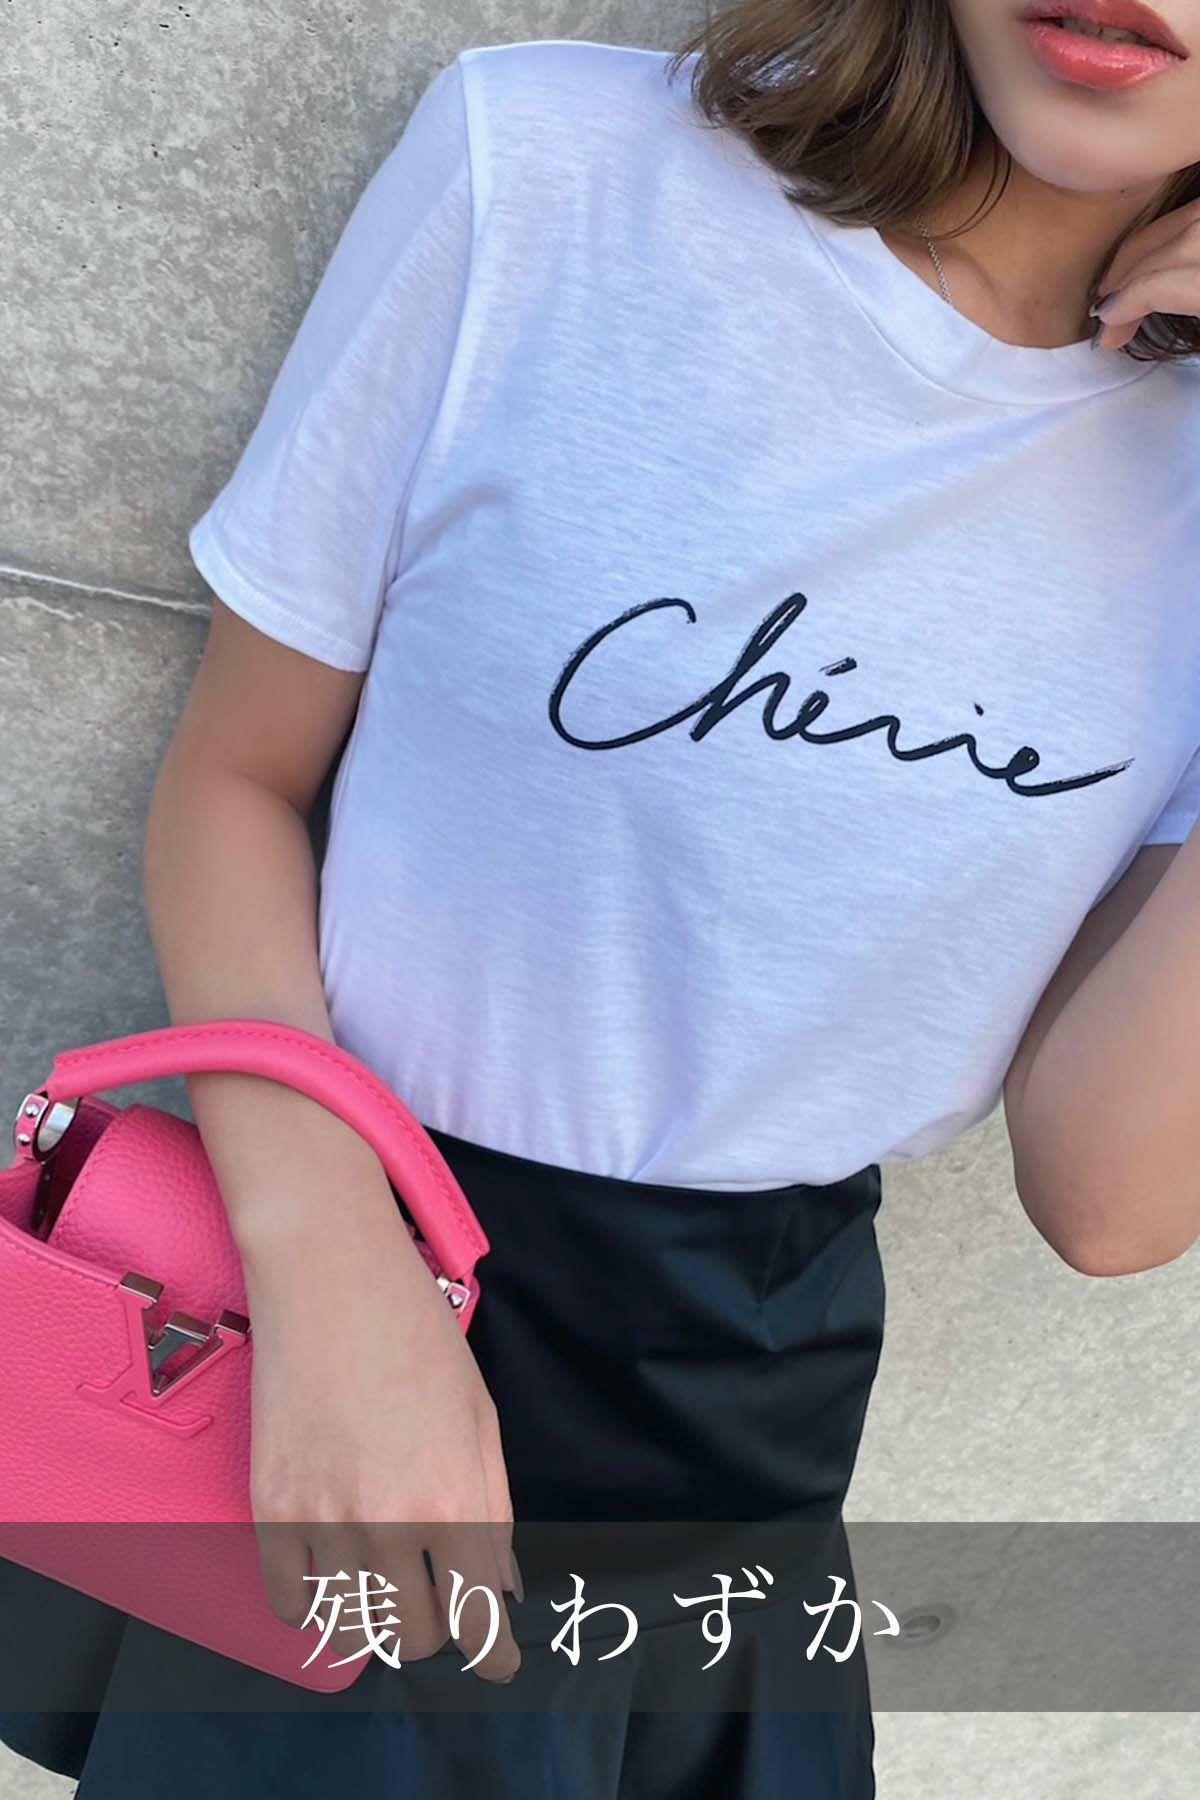 chérieTシャツ